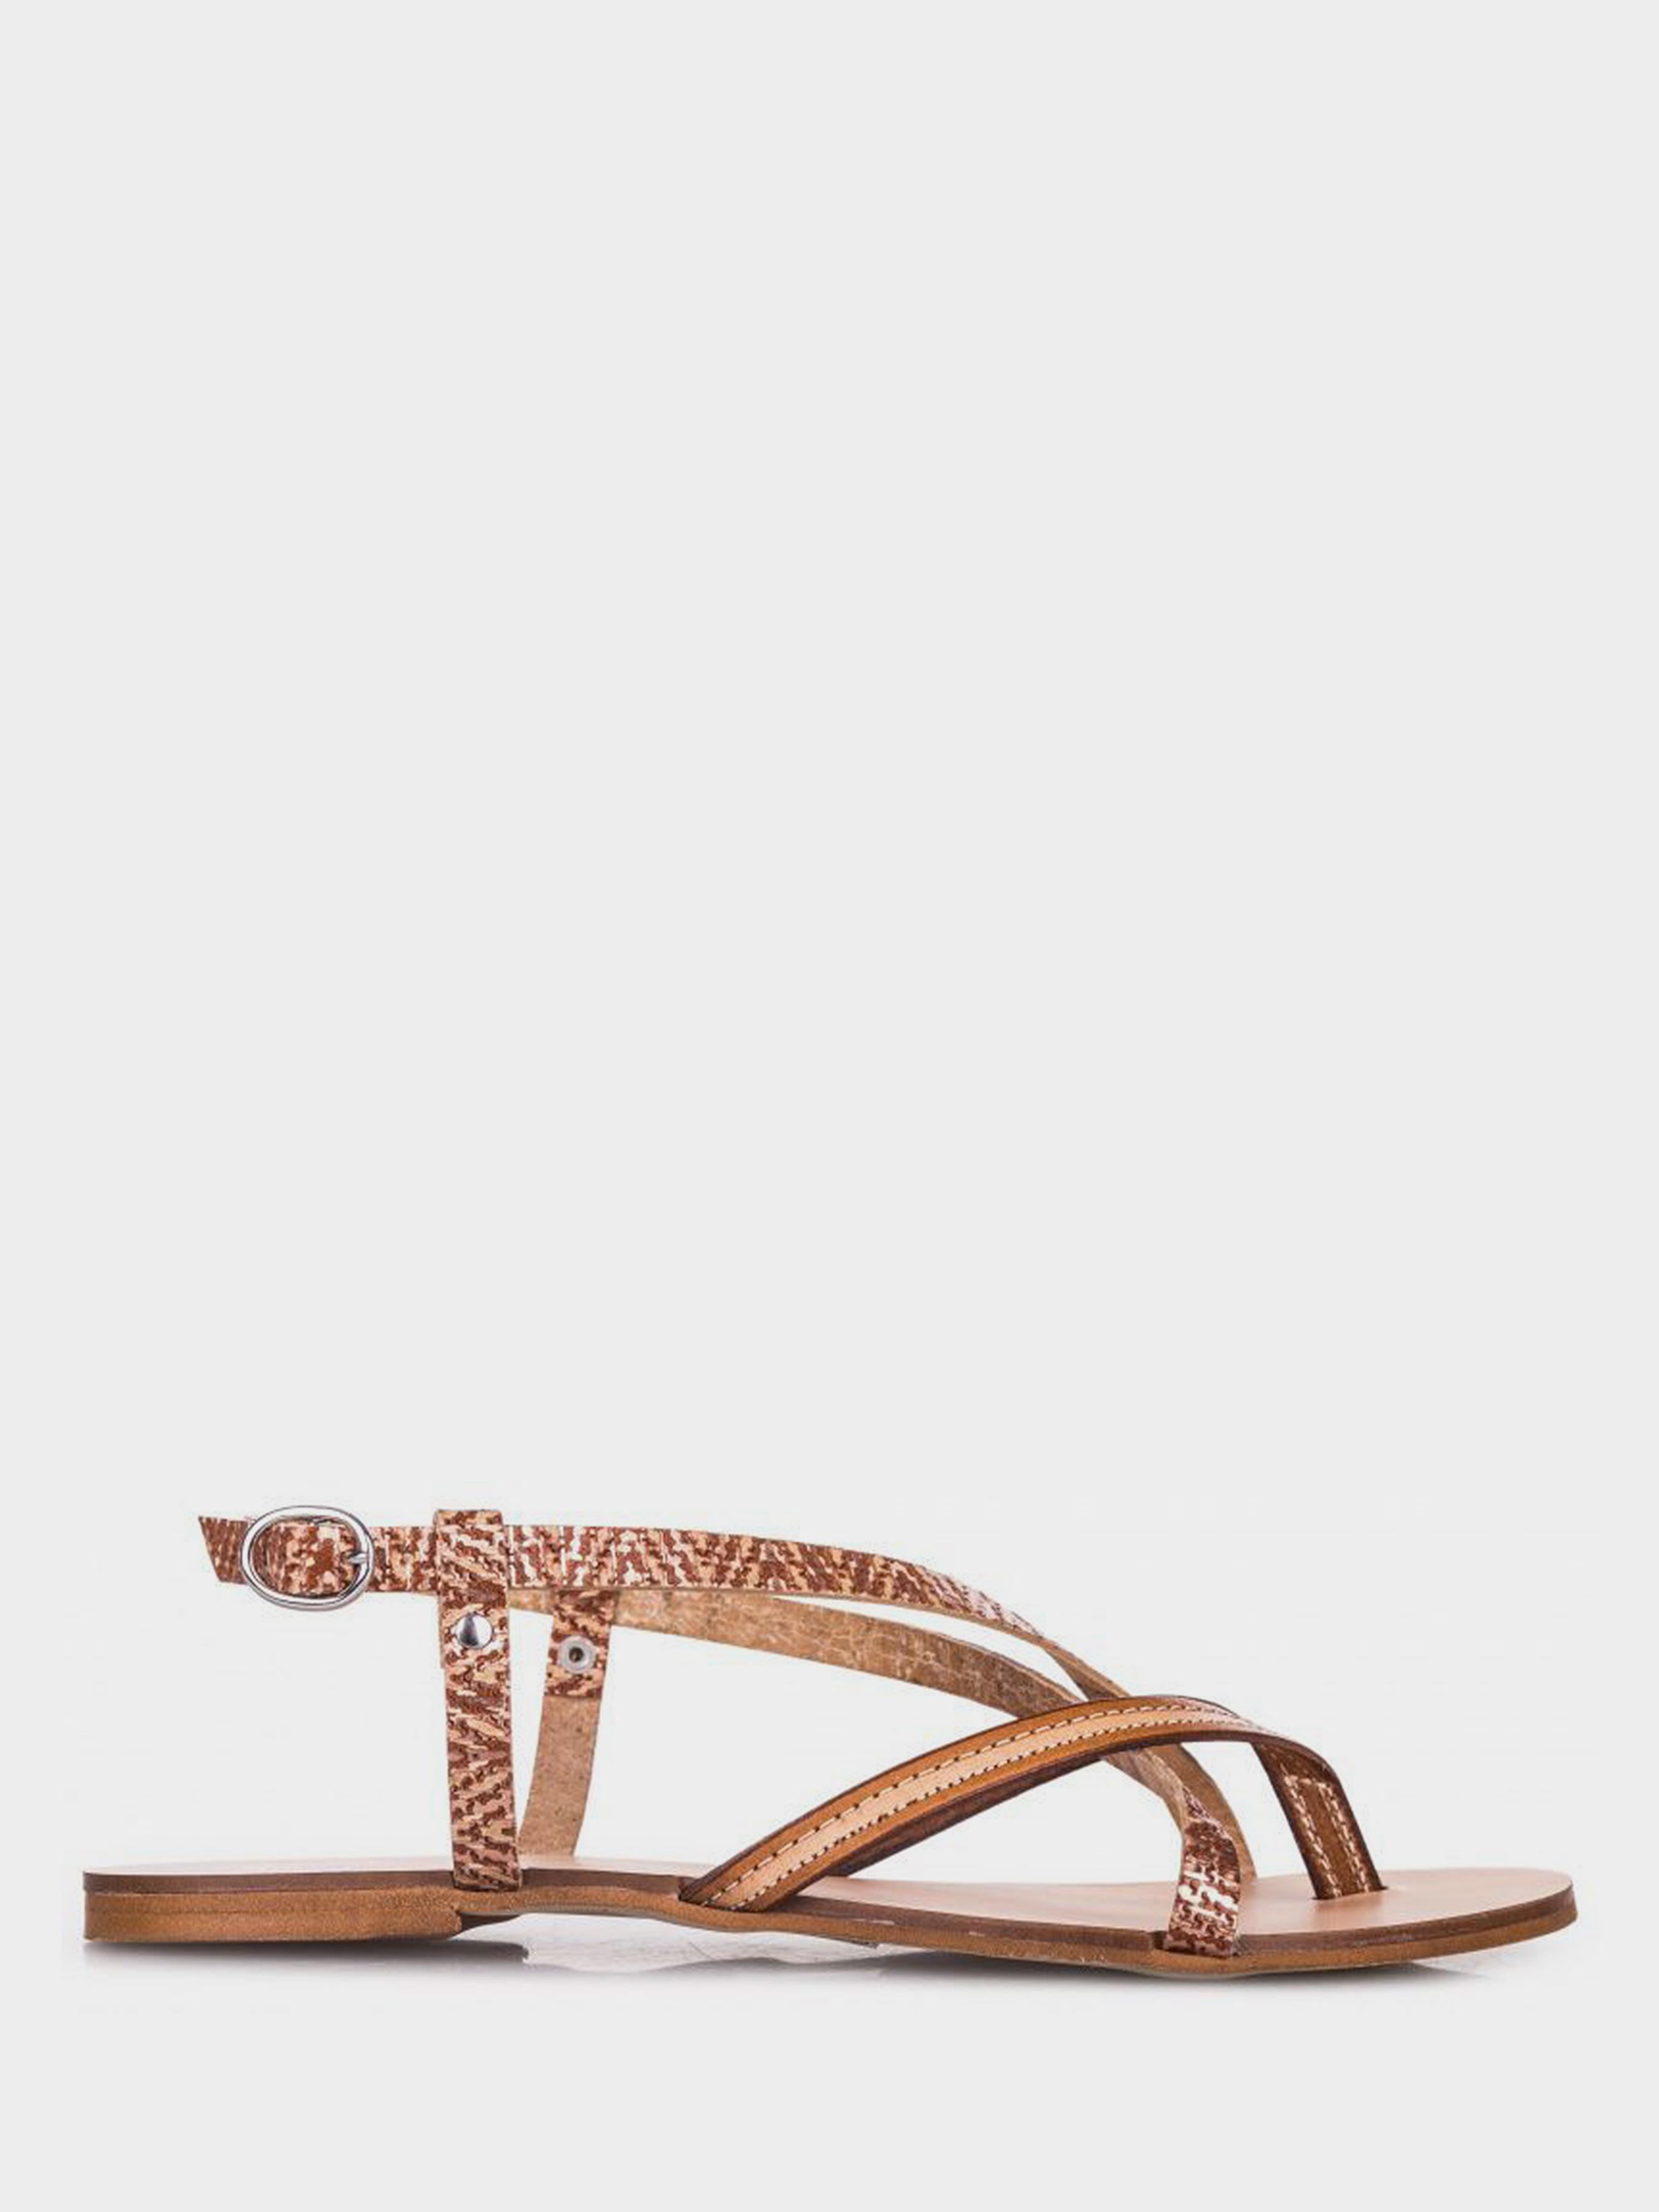 Сандалии для женщин Casta & Dolly 1Z58 модная обувь, 2017